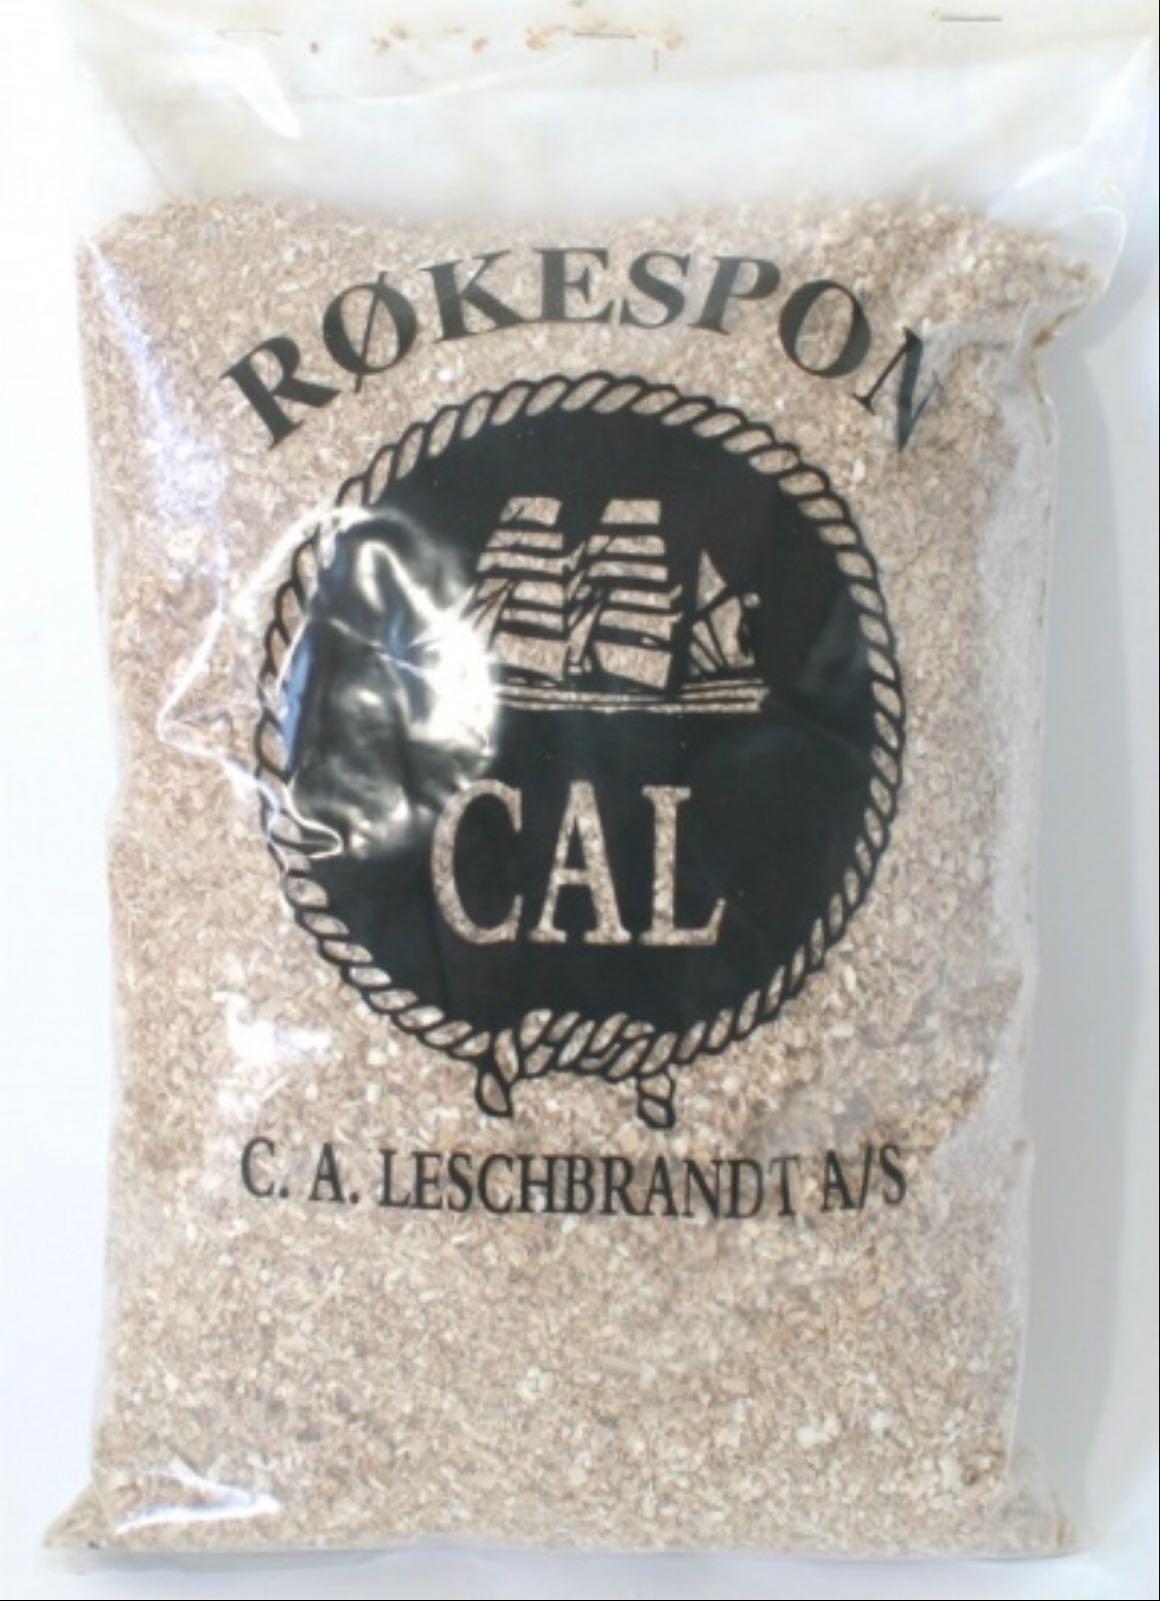 CAL Røkspon